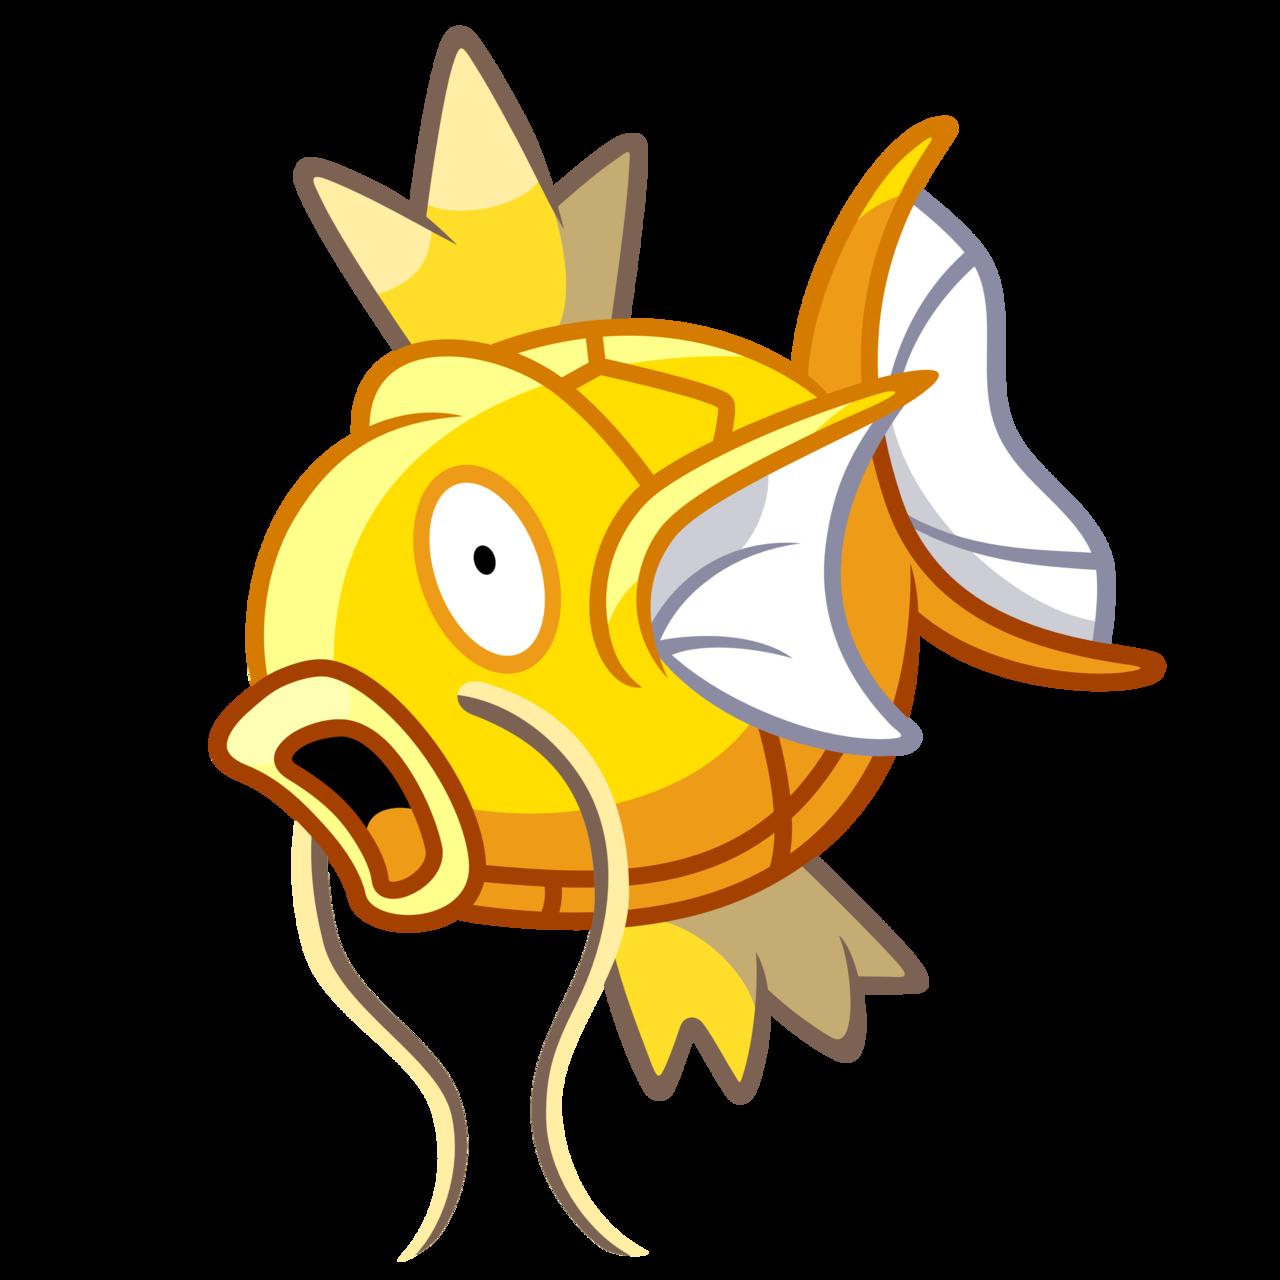 Pokémon Sprite Vector Shiny Magikarp. Sprite from